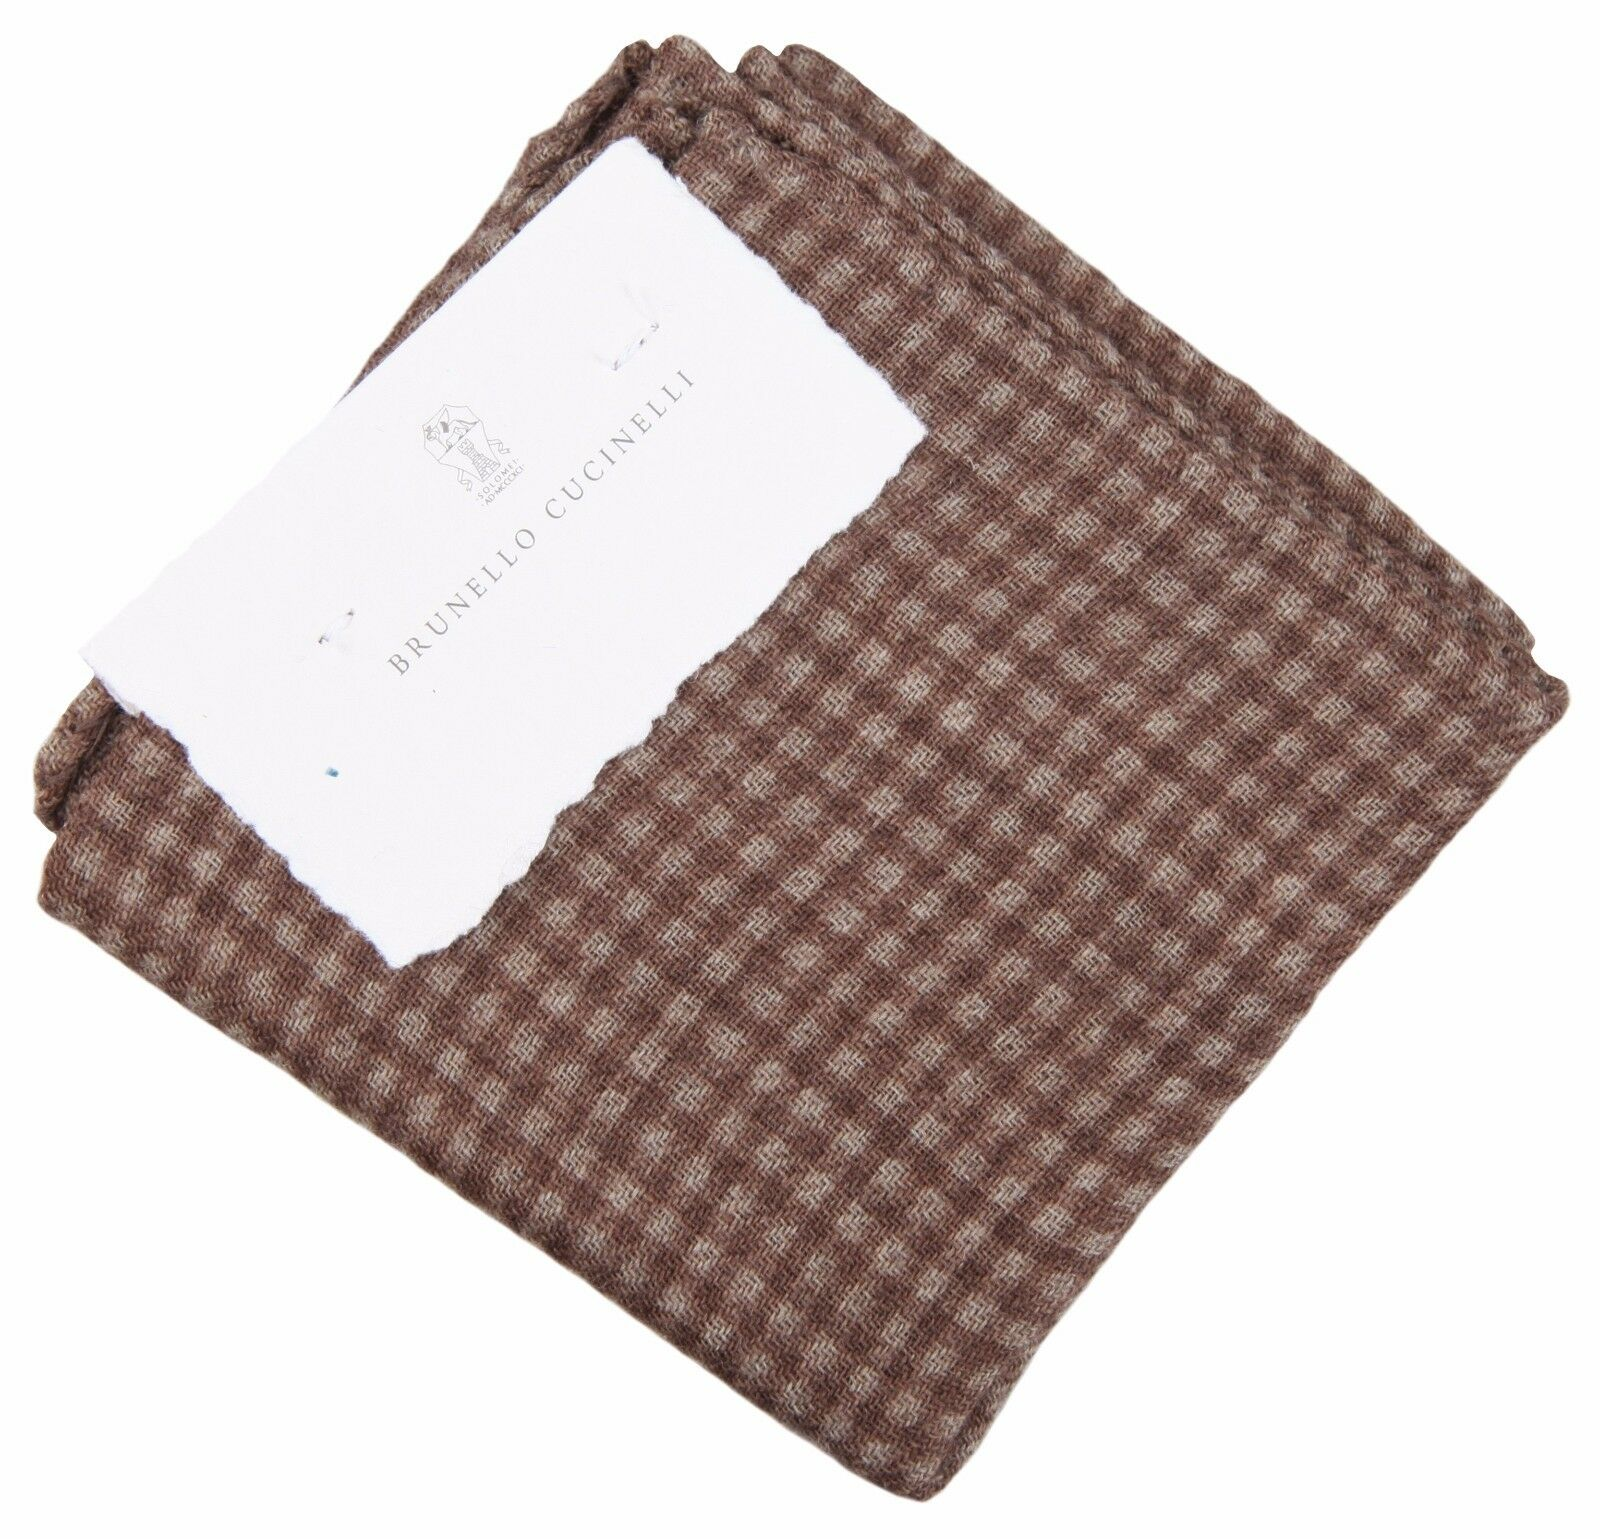 Brunello Cucinelli plastrón Handkerchief pochette pañuelo cloth pañuelo nuevo